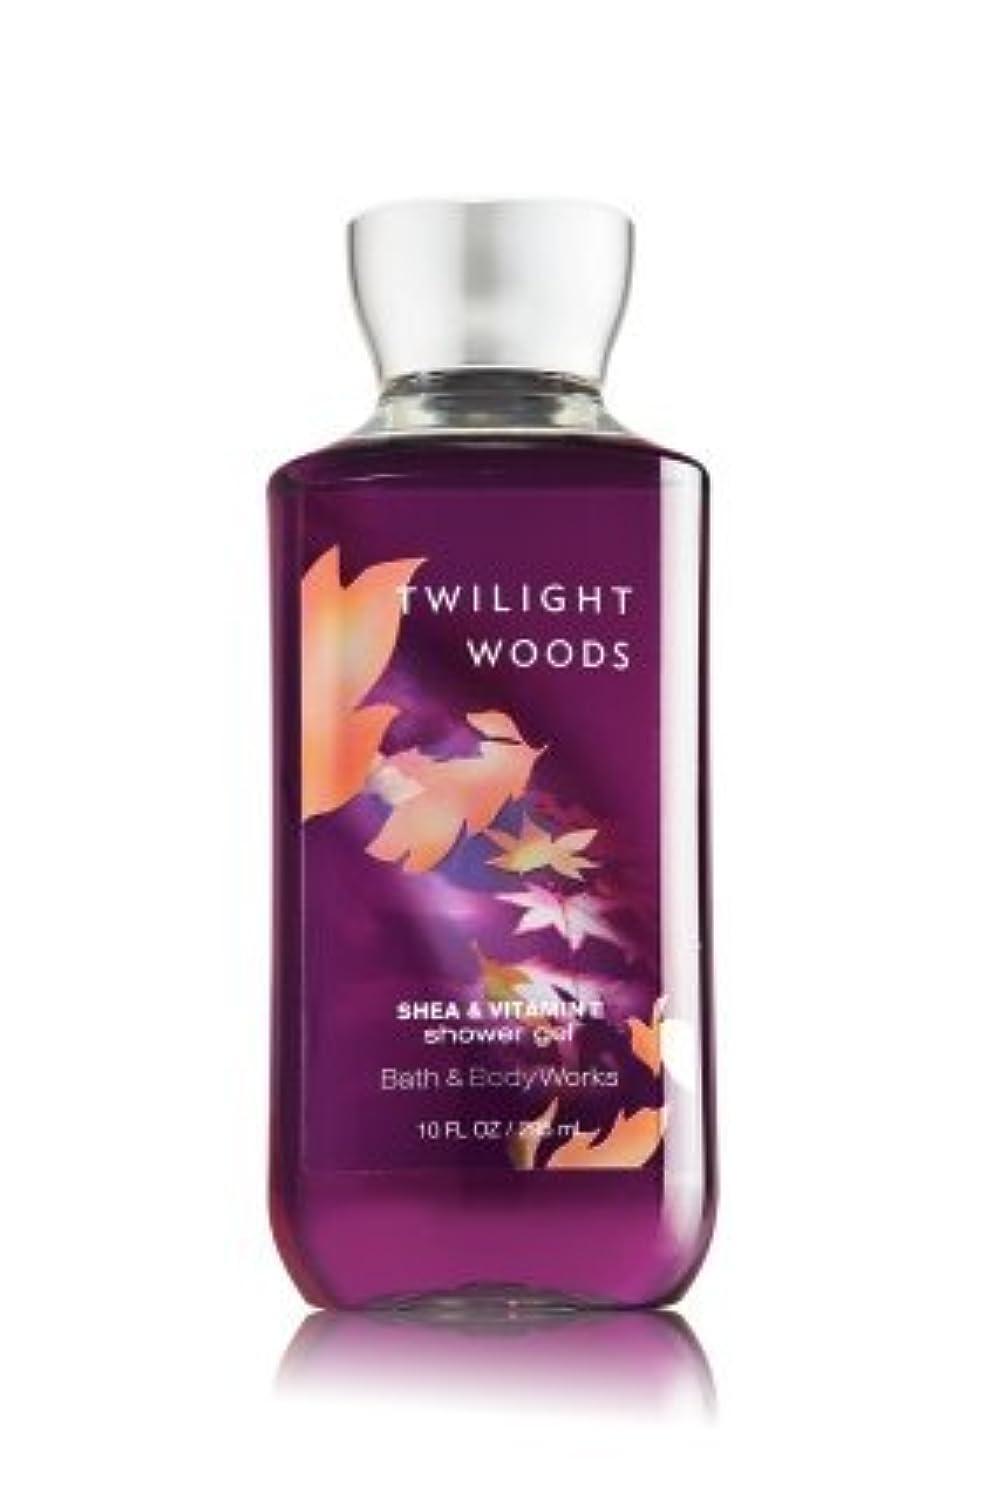 【Bath&Body Works/バス&ボディワークス】 シャワージェル トワイライトウッズ Shower Gel Twilight Woods 10 fl oz / 295 mL [並行輸入品]